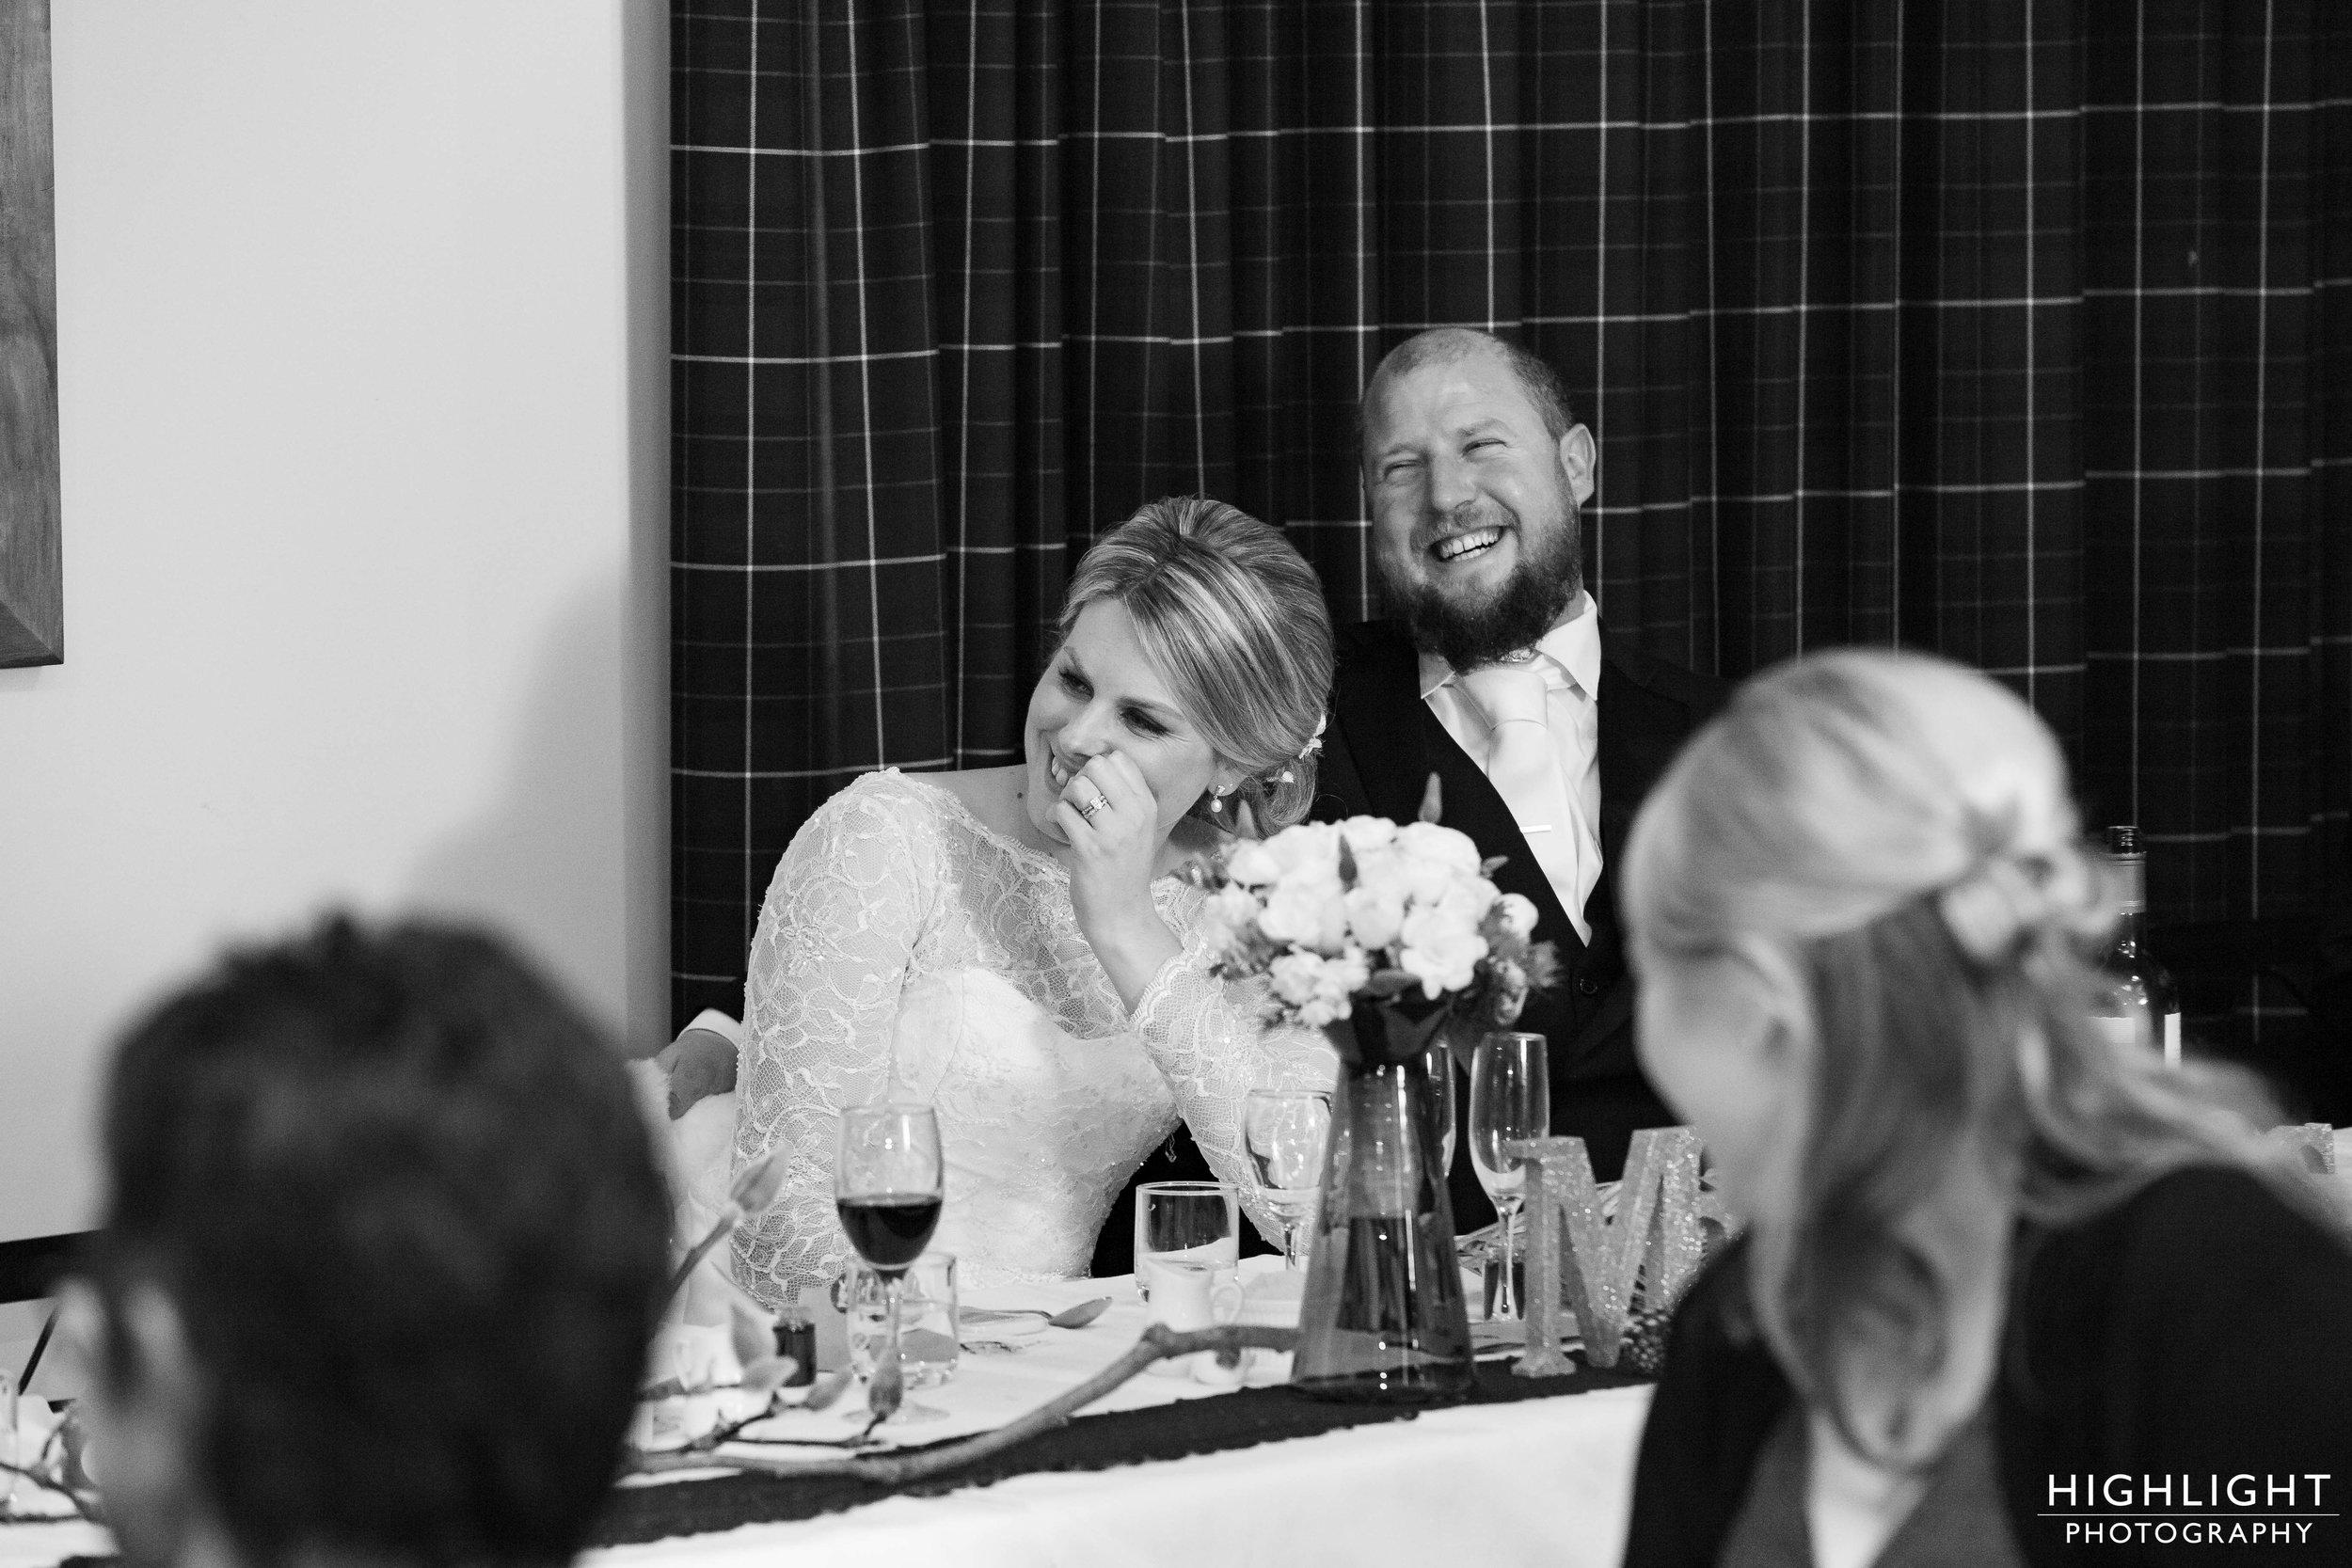 makoura-wedding-photography-highlight-new-zealand-81.jpg